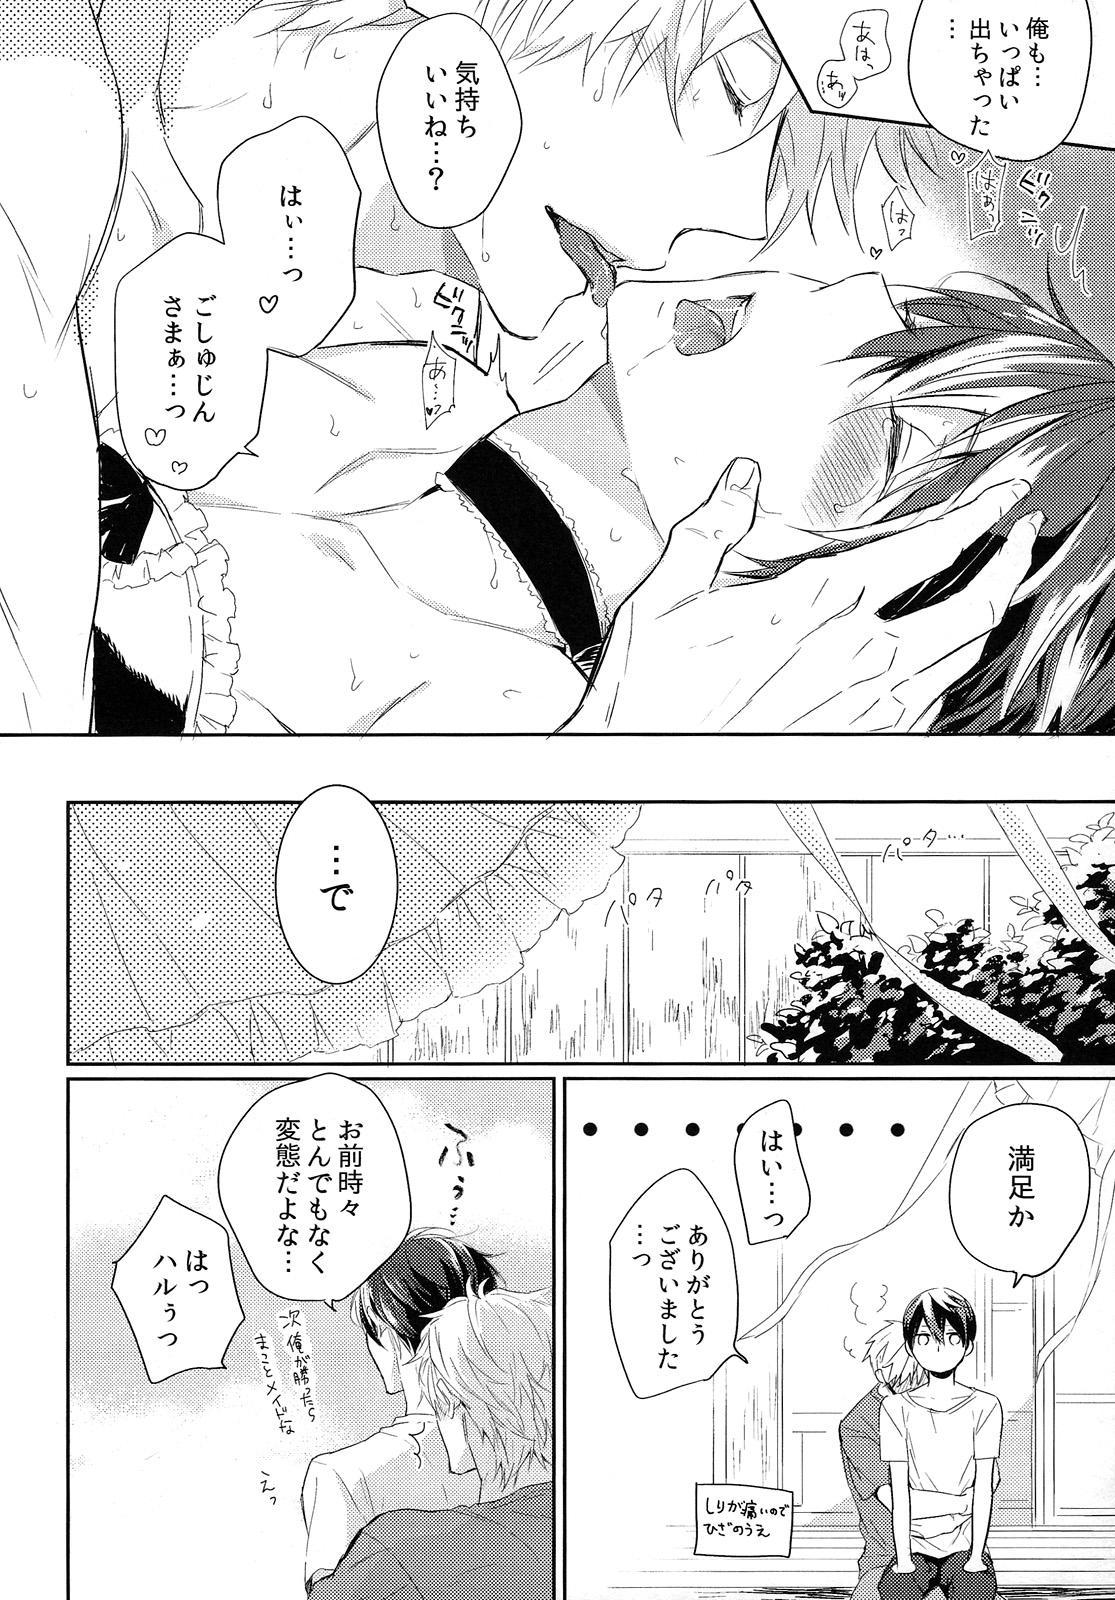 Kocchi Muite Maid-san 18